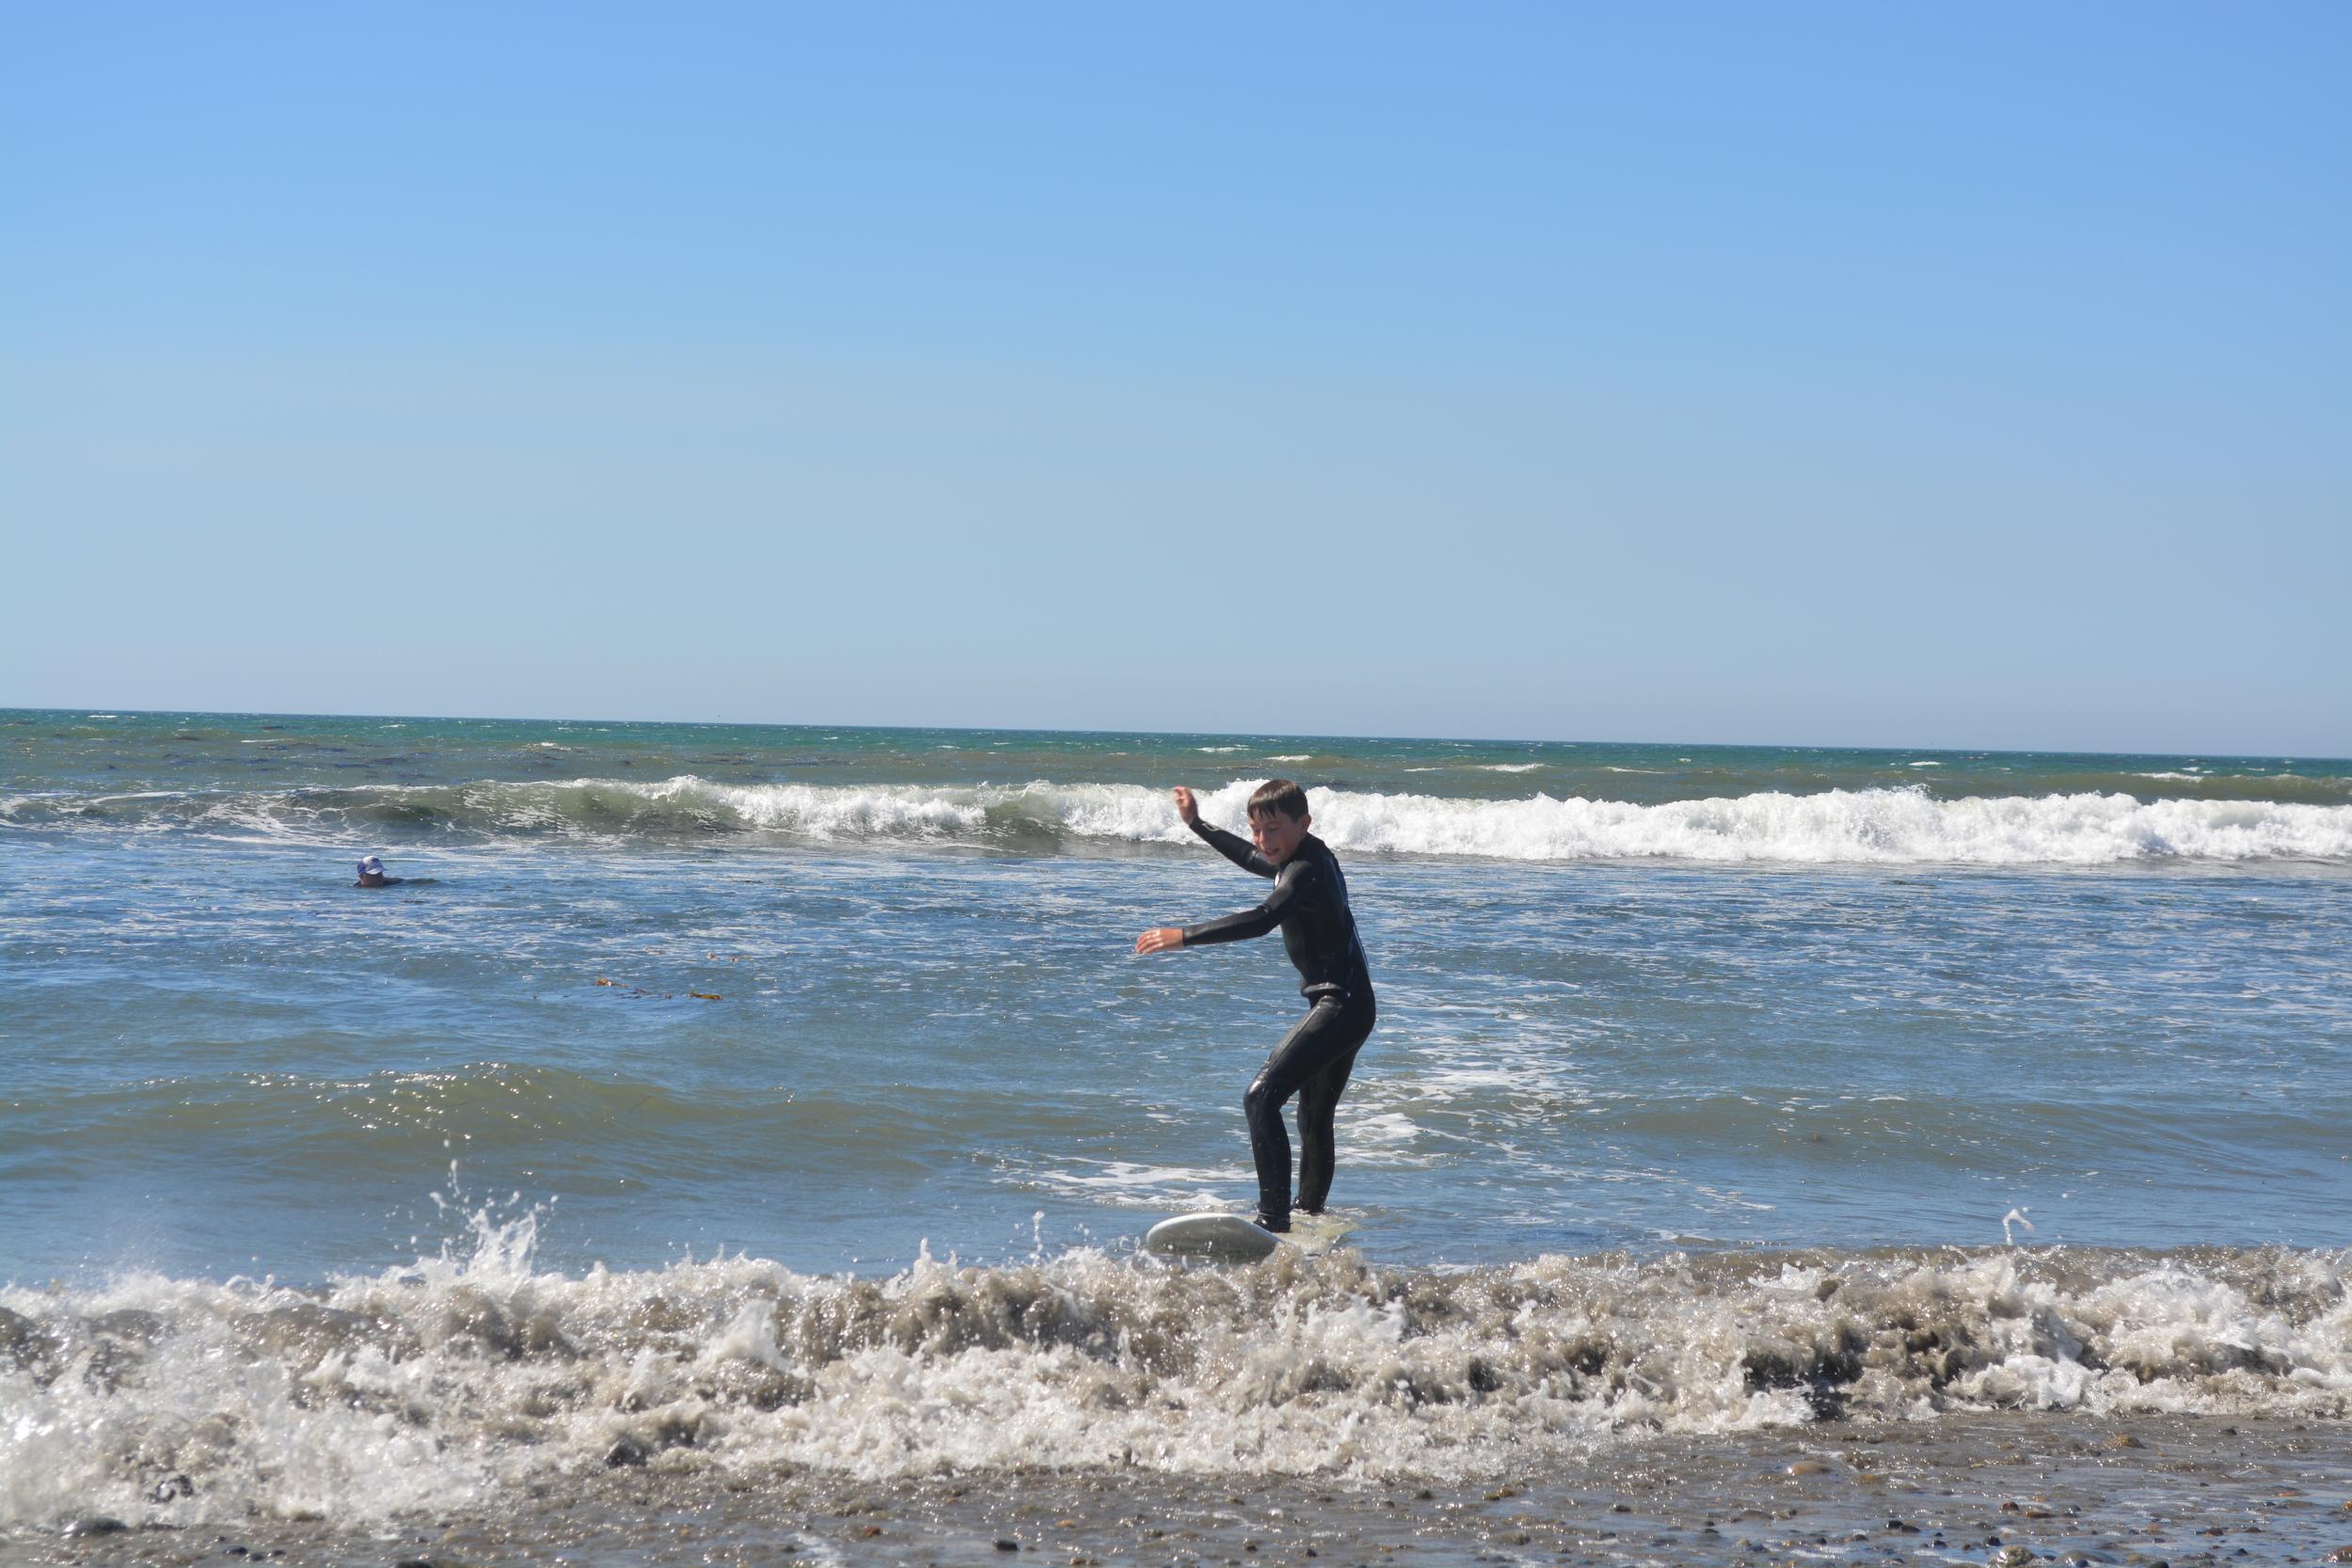 Baja California 10-5-13 Shipwrecks Surfing Adventure Ocean Experience Surf School San Diego (3).JPG